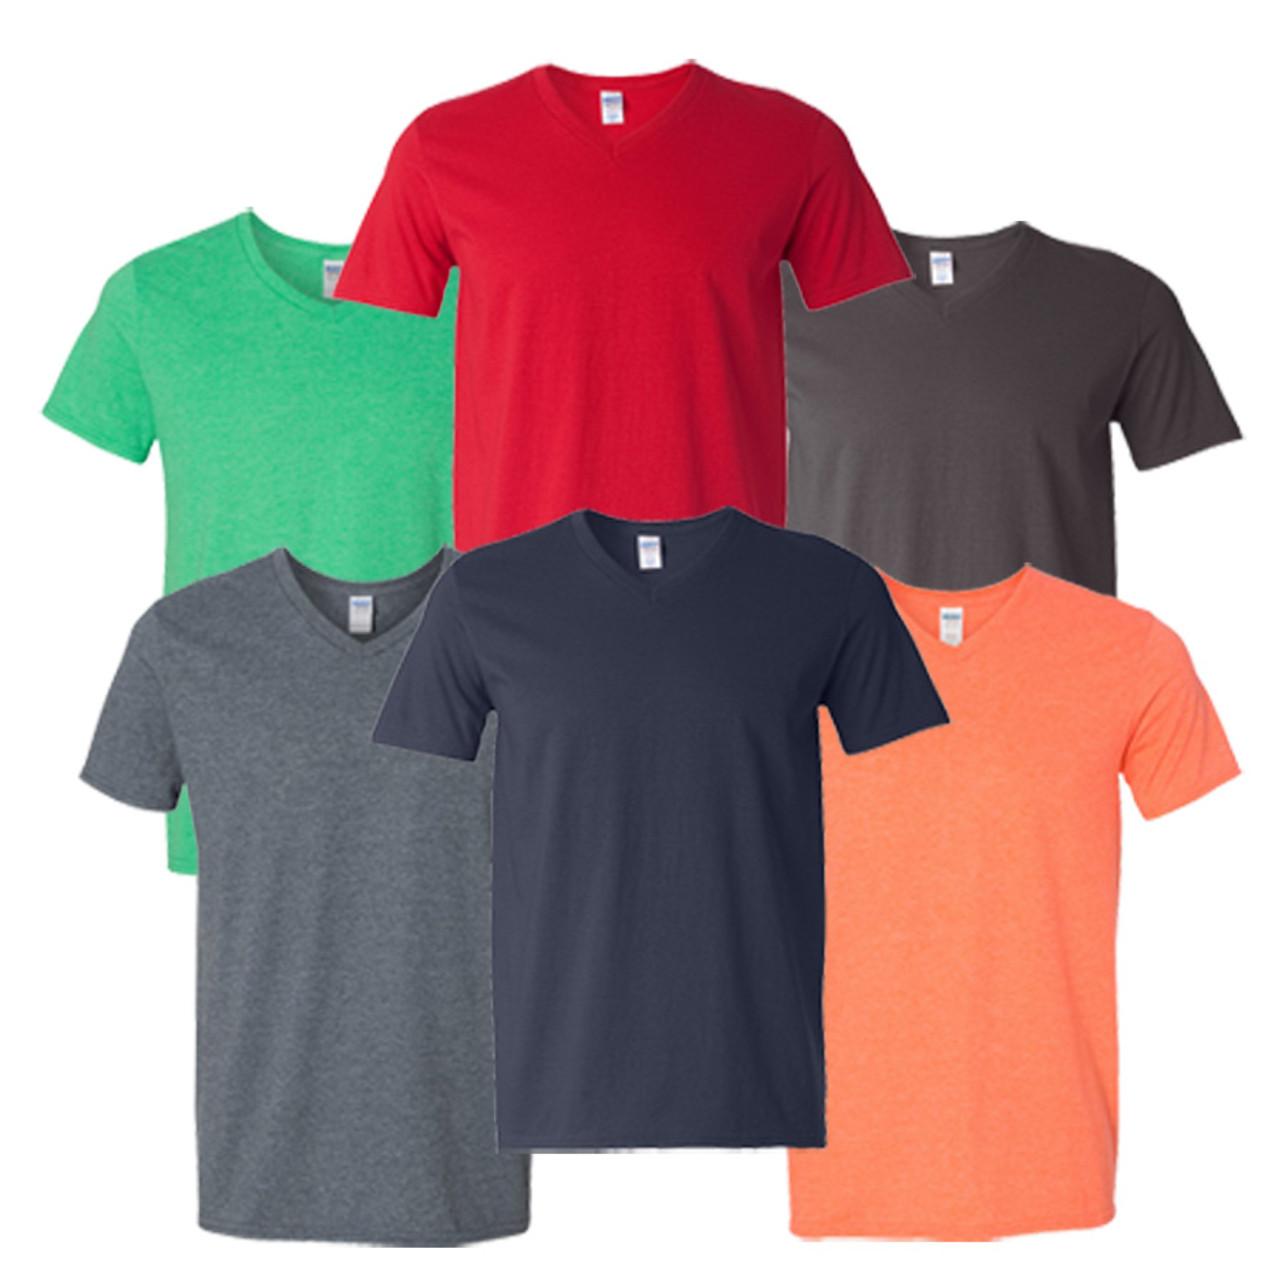 6d47970915 Slight Irregular V Necks 100% Cotton T-shirts 12 pcs IR64V0